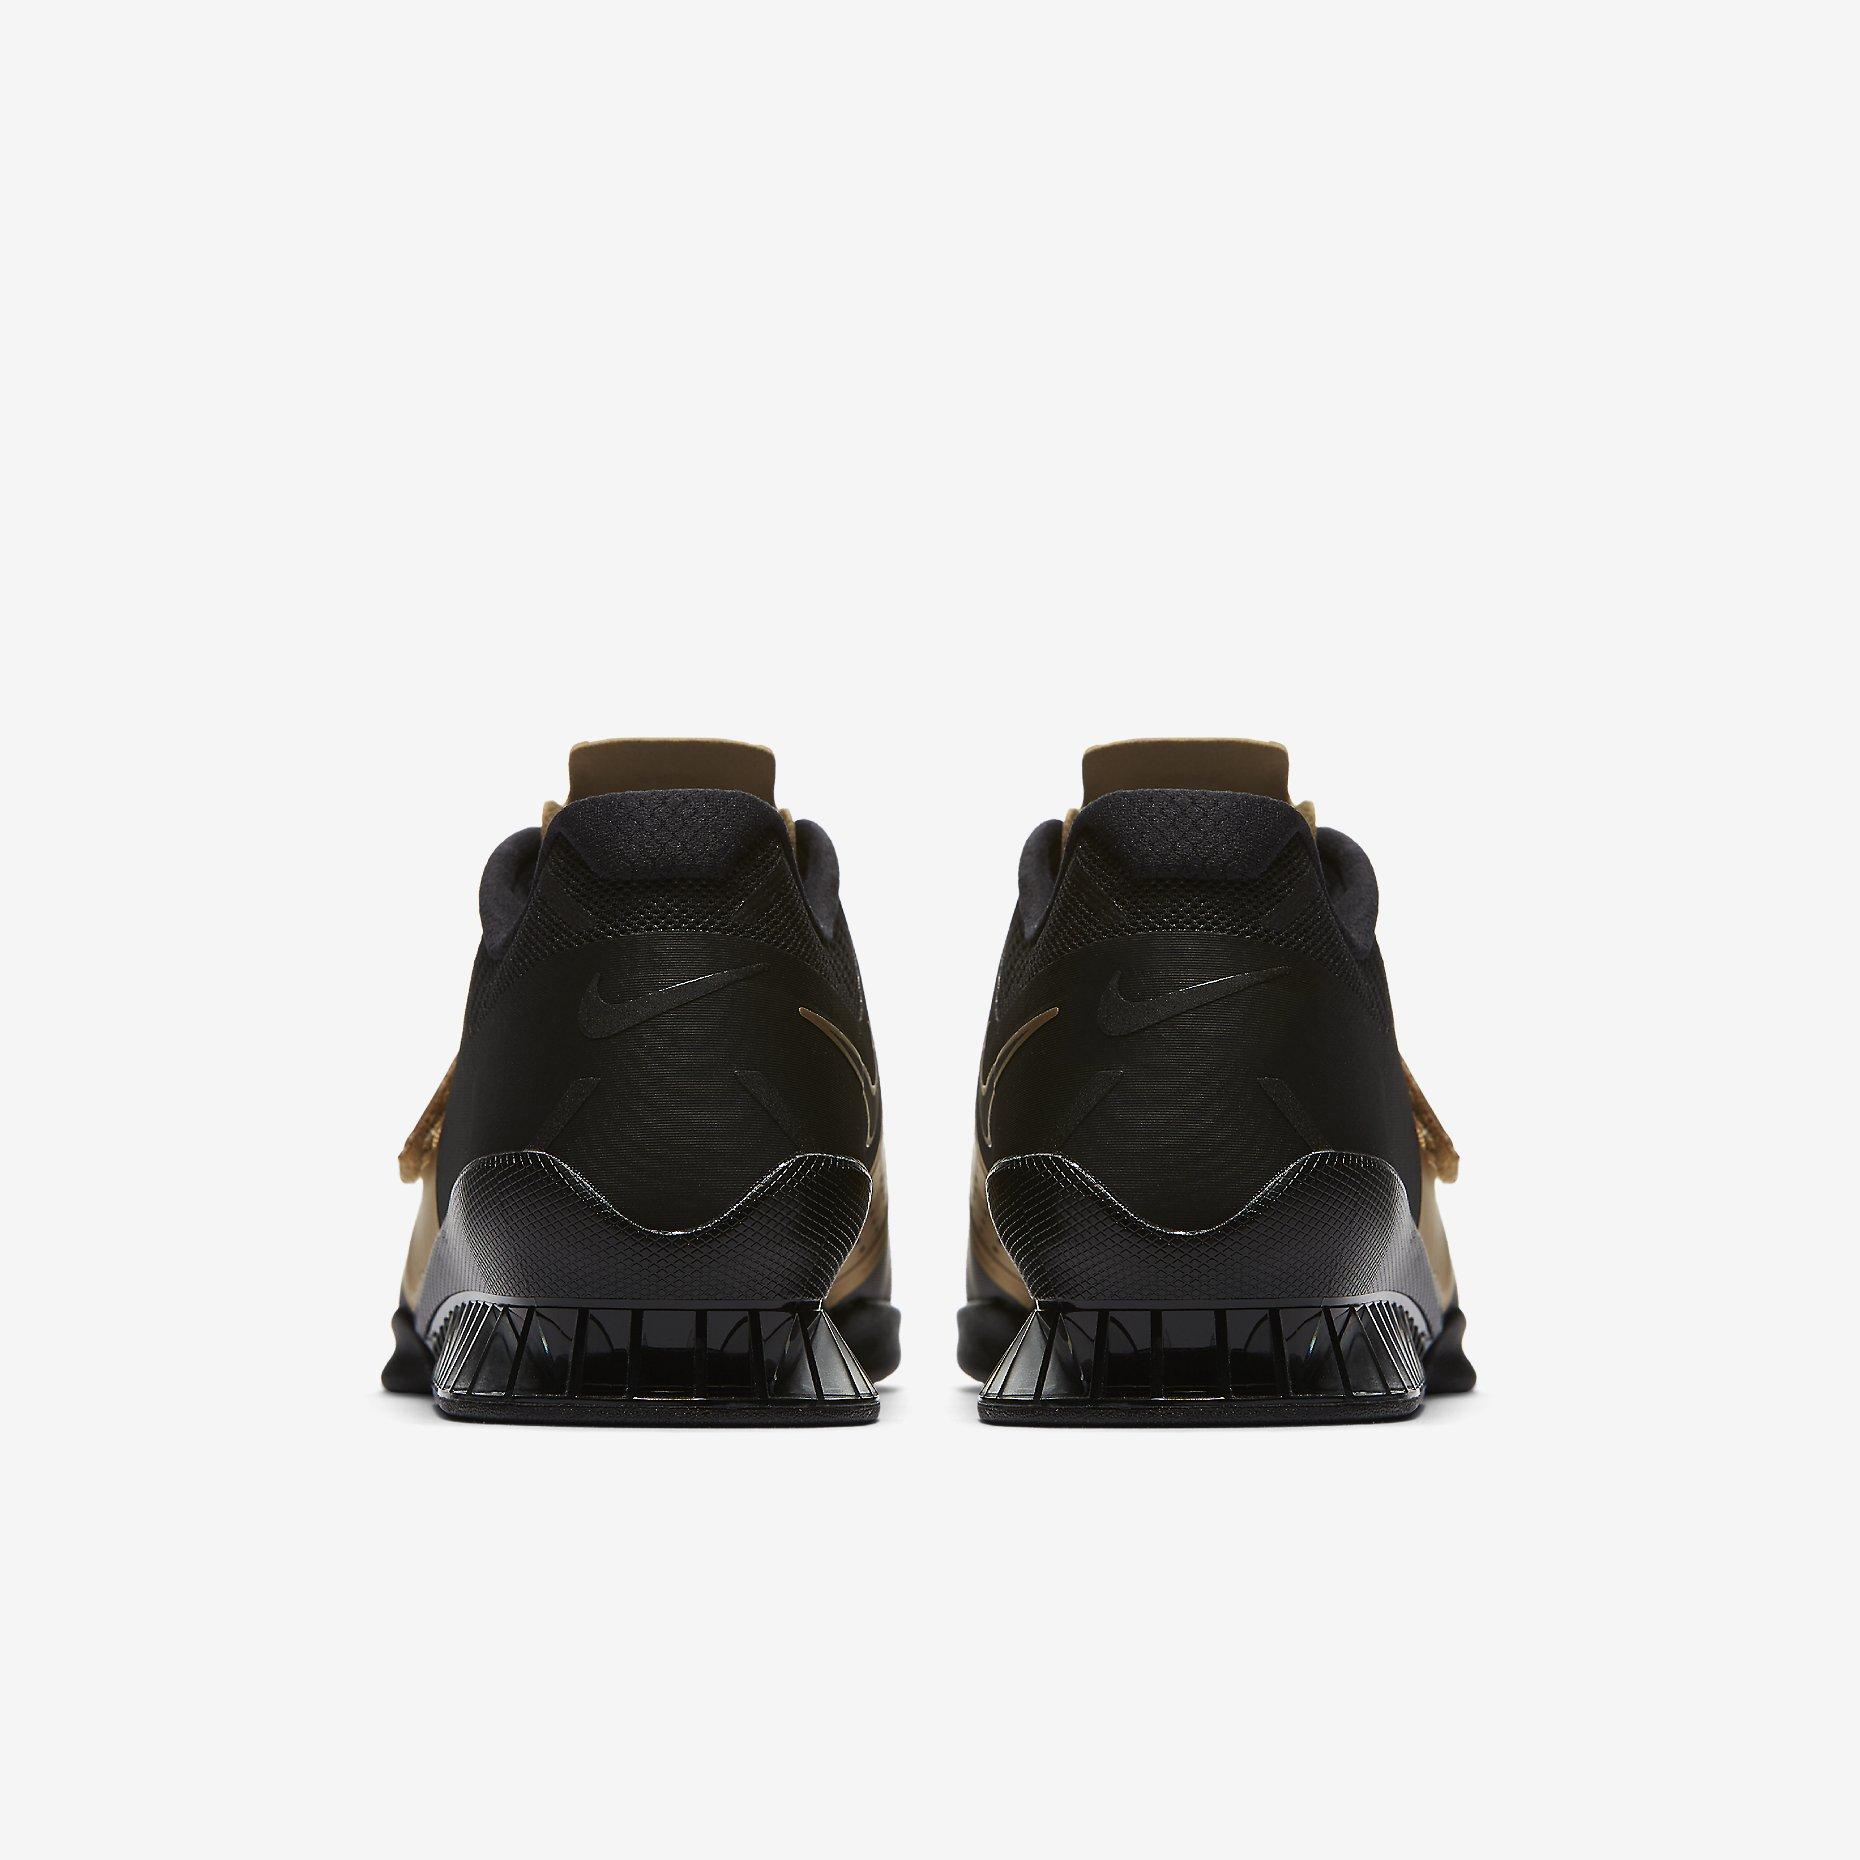 romaleos-3-x-mens-training-shoe (5)